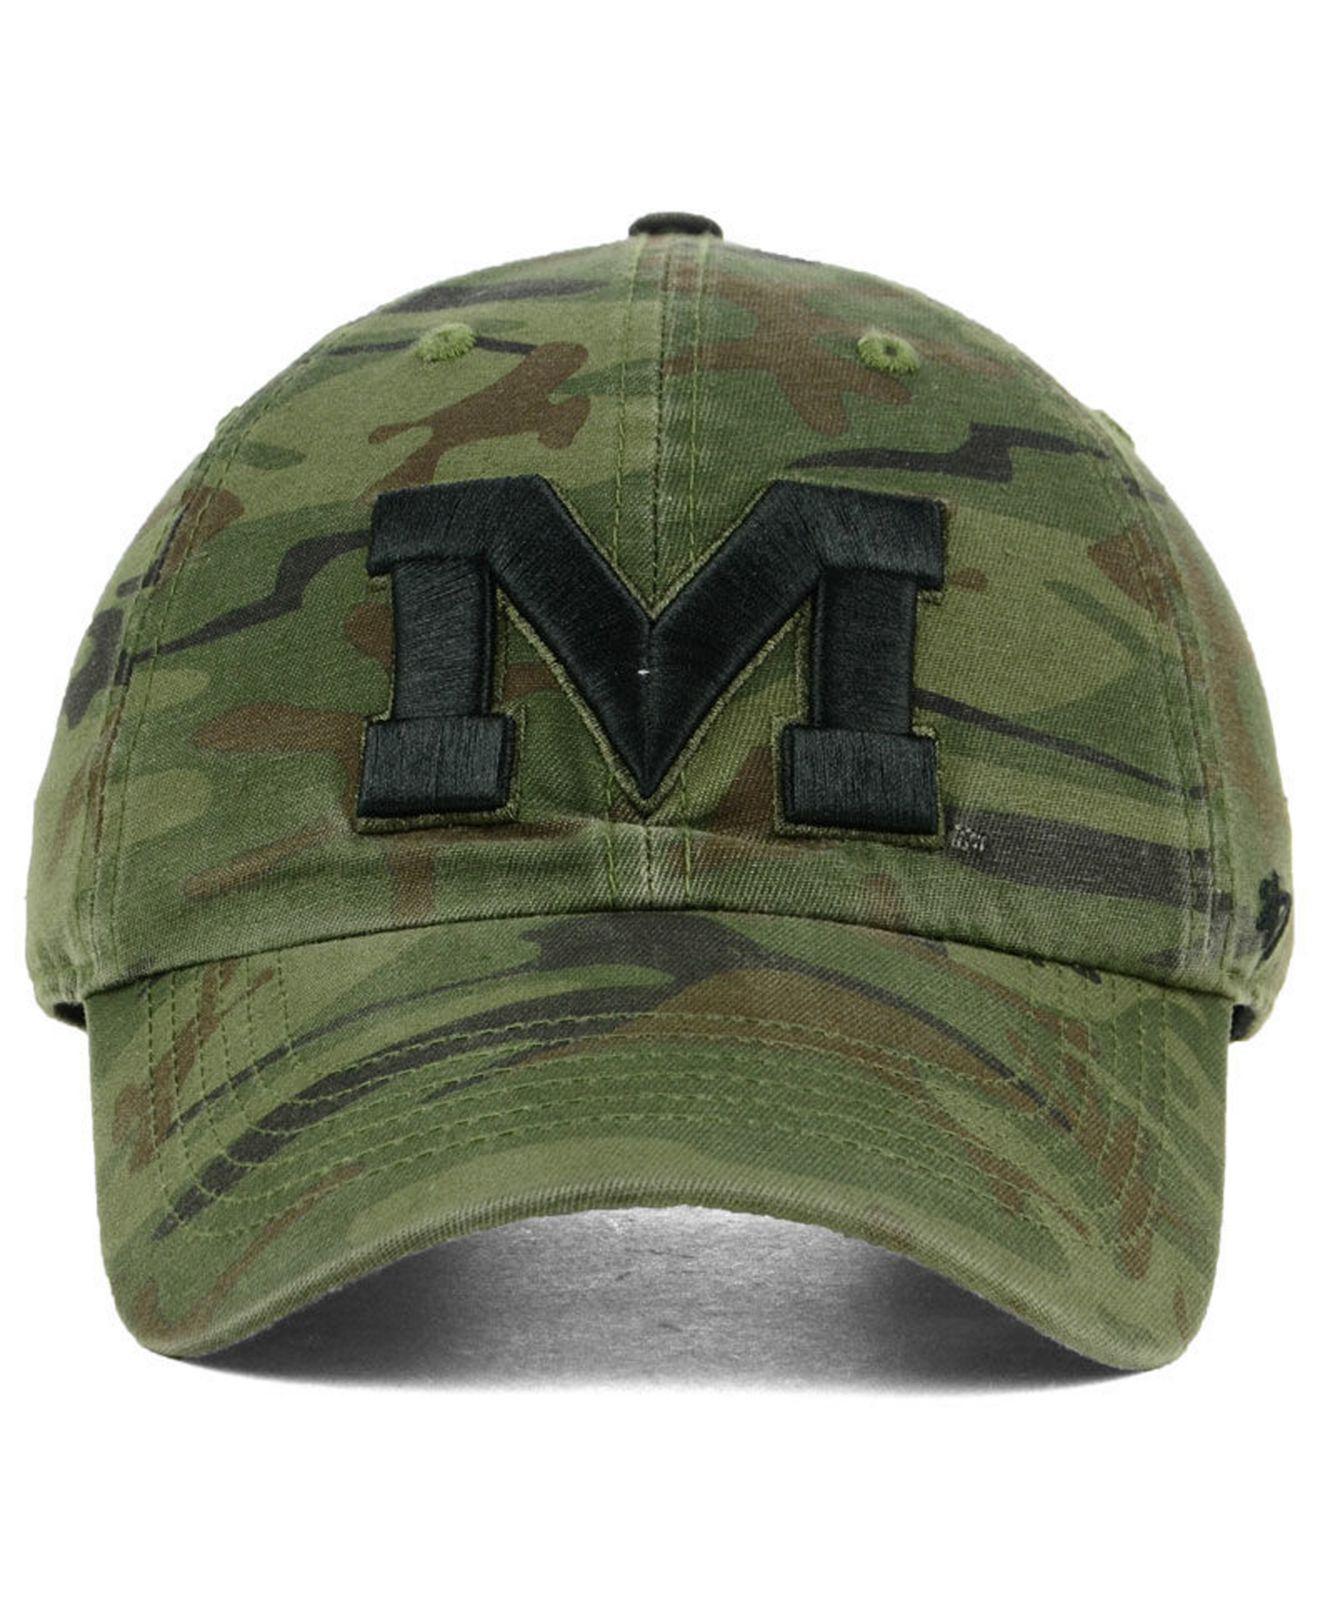 a9098ec4dd4 Lyst - 47 Brand Ole Miss Rebels Regiment Clean Up Strapback Cap in Green  for Men